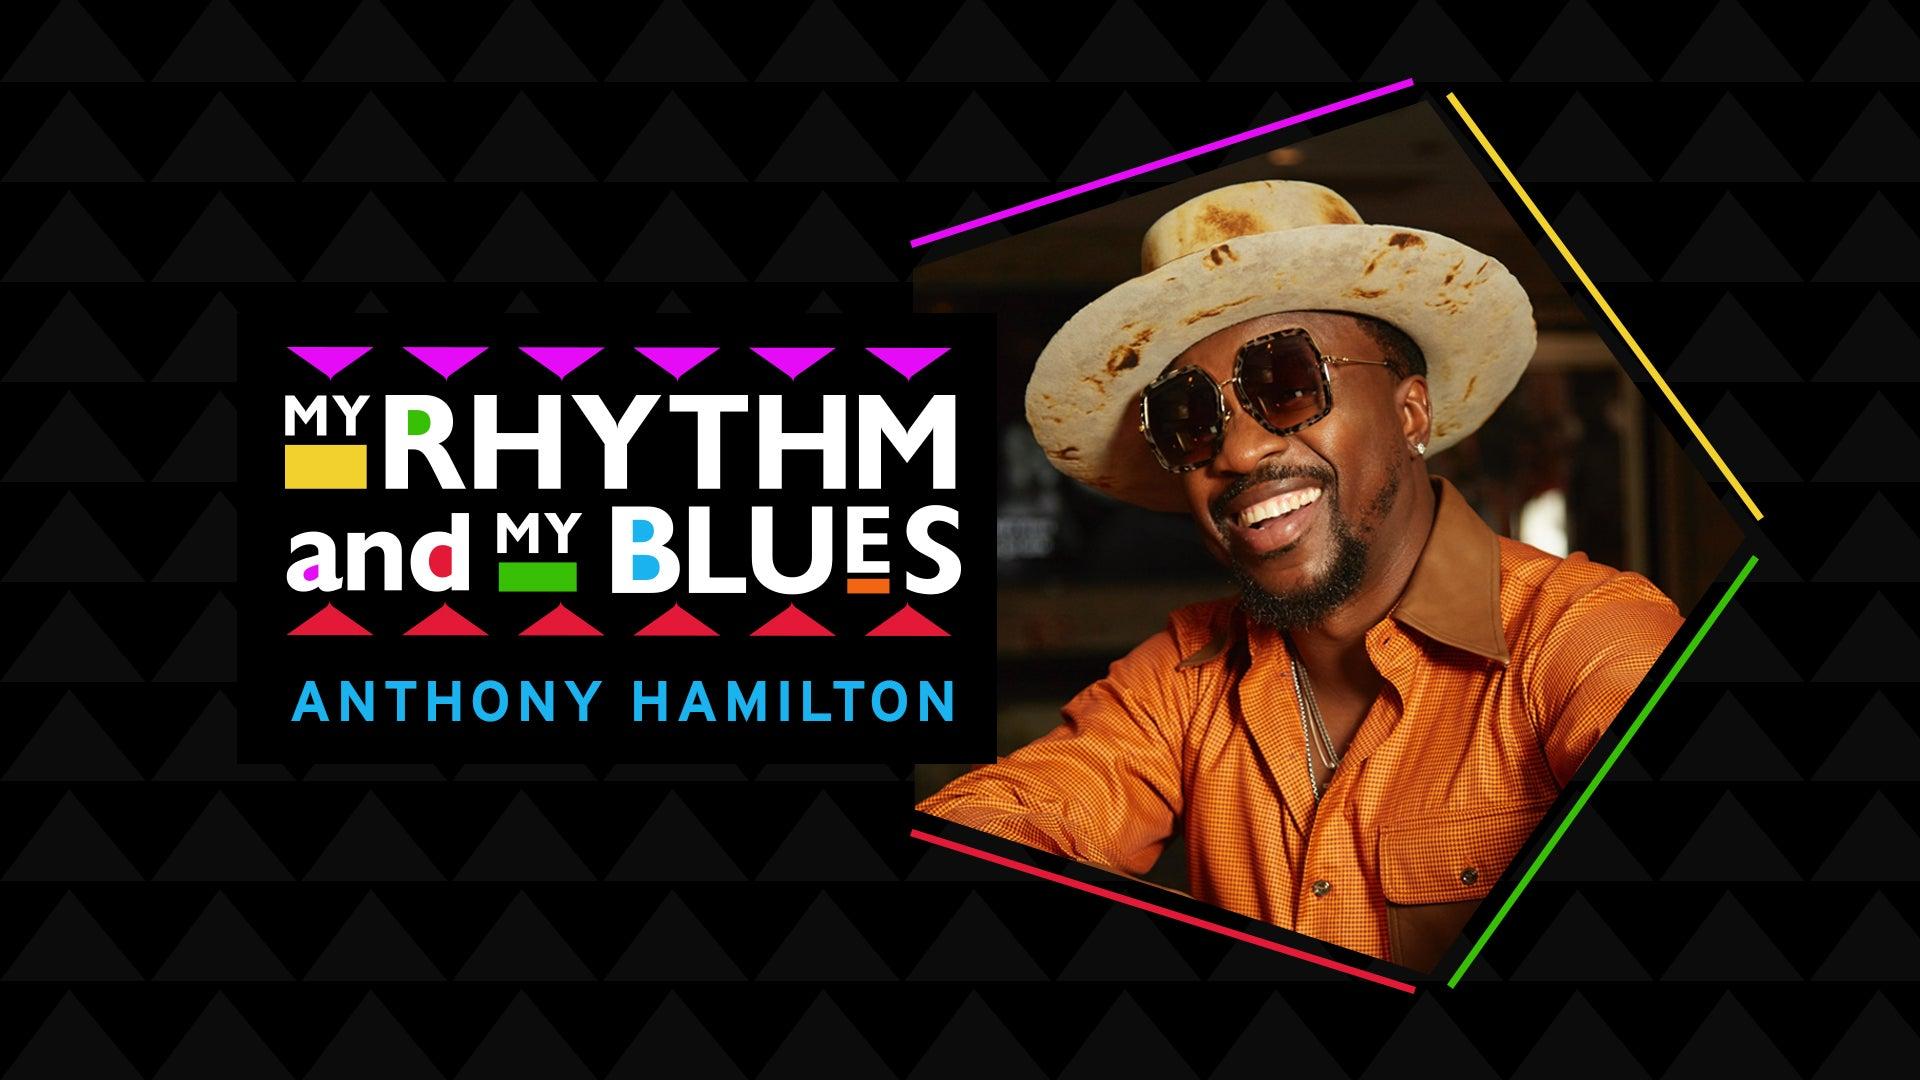 My Rhythm and My Blues: Anthony Hamilton